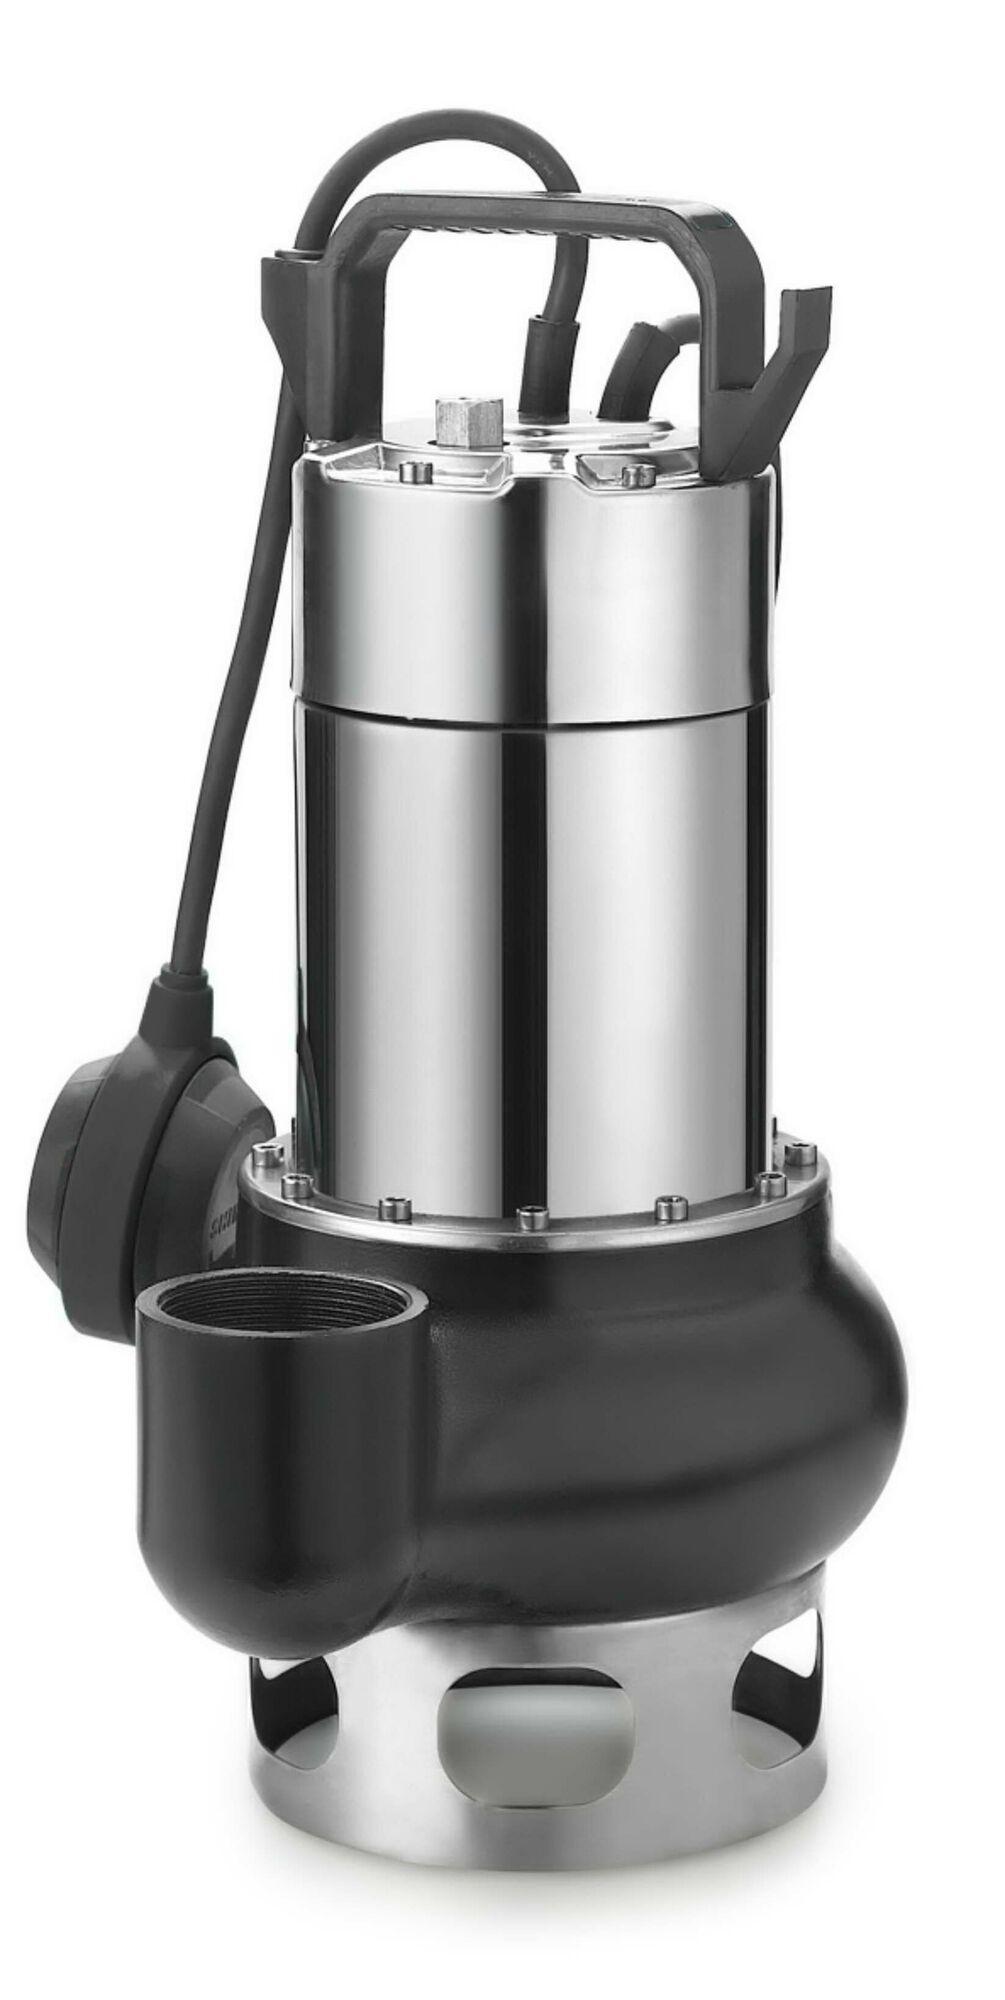 Eurom SPV750i Professionele vuilwaterpomp 750W | Dompelpomp